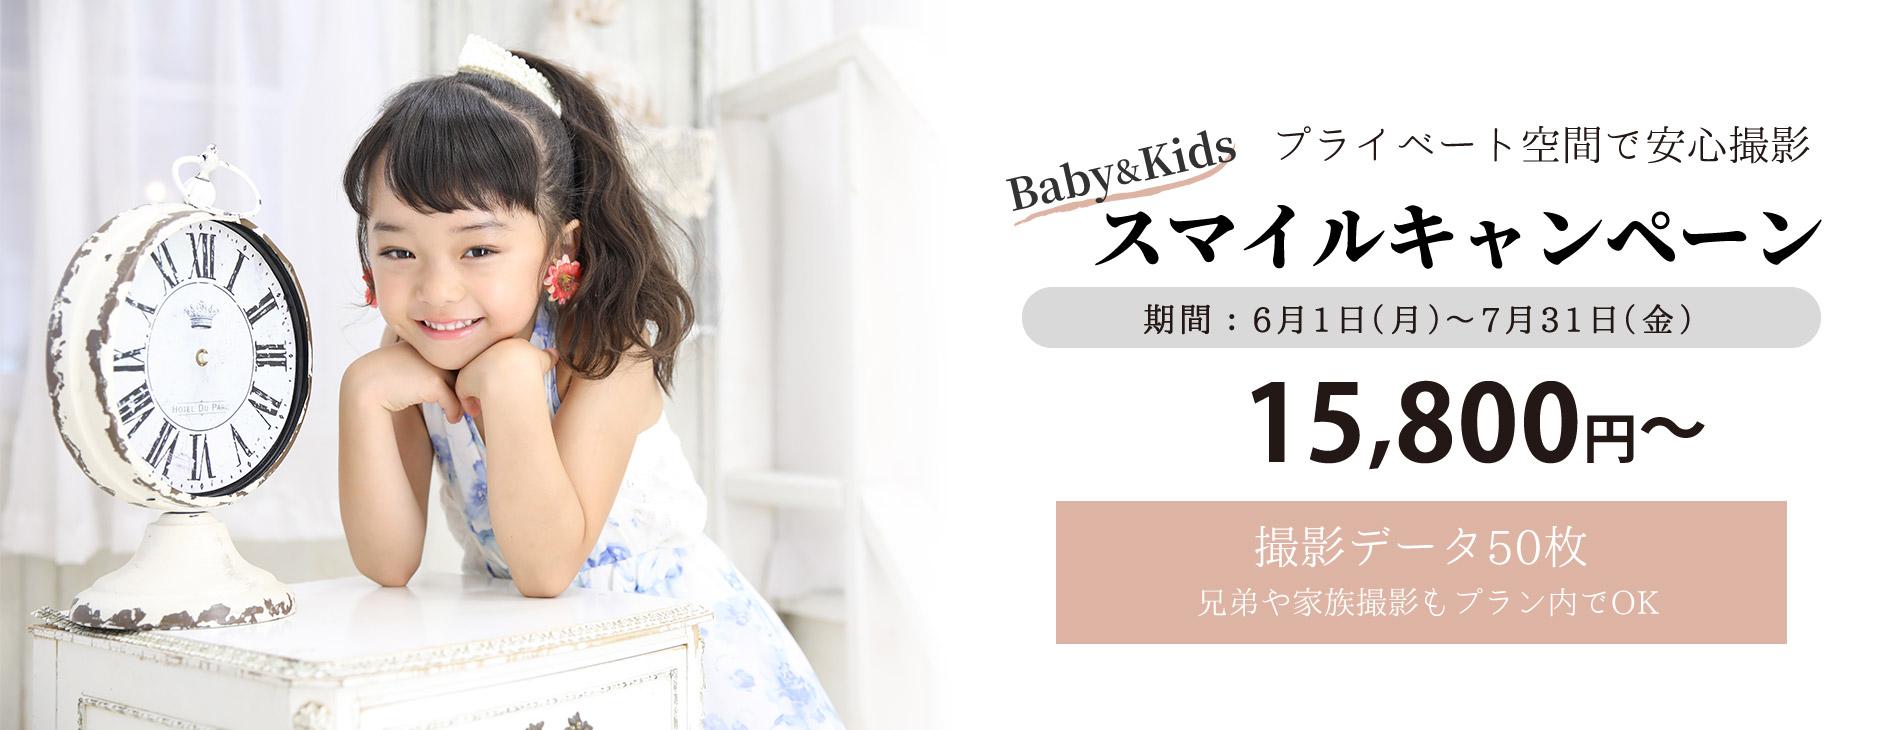 Baby&Kidsスマイルキャンペーン